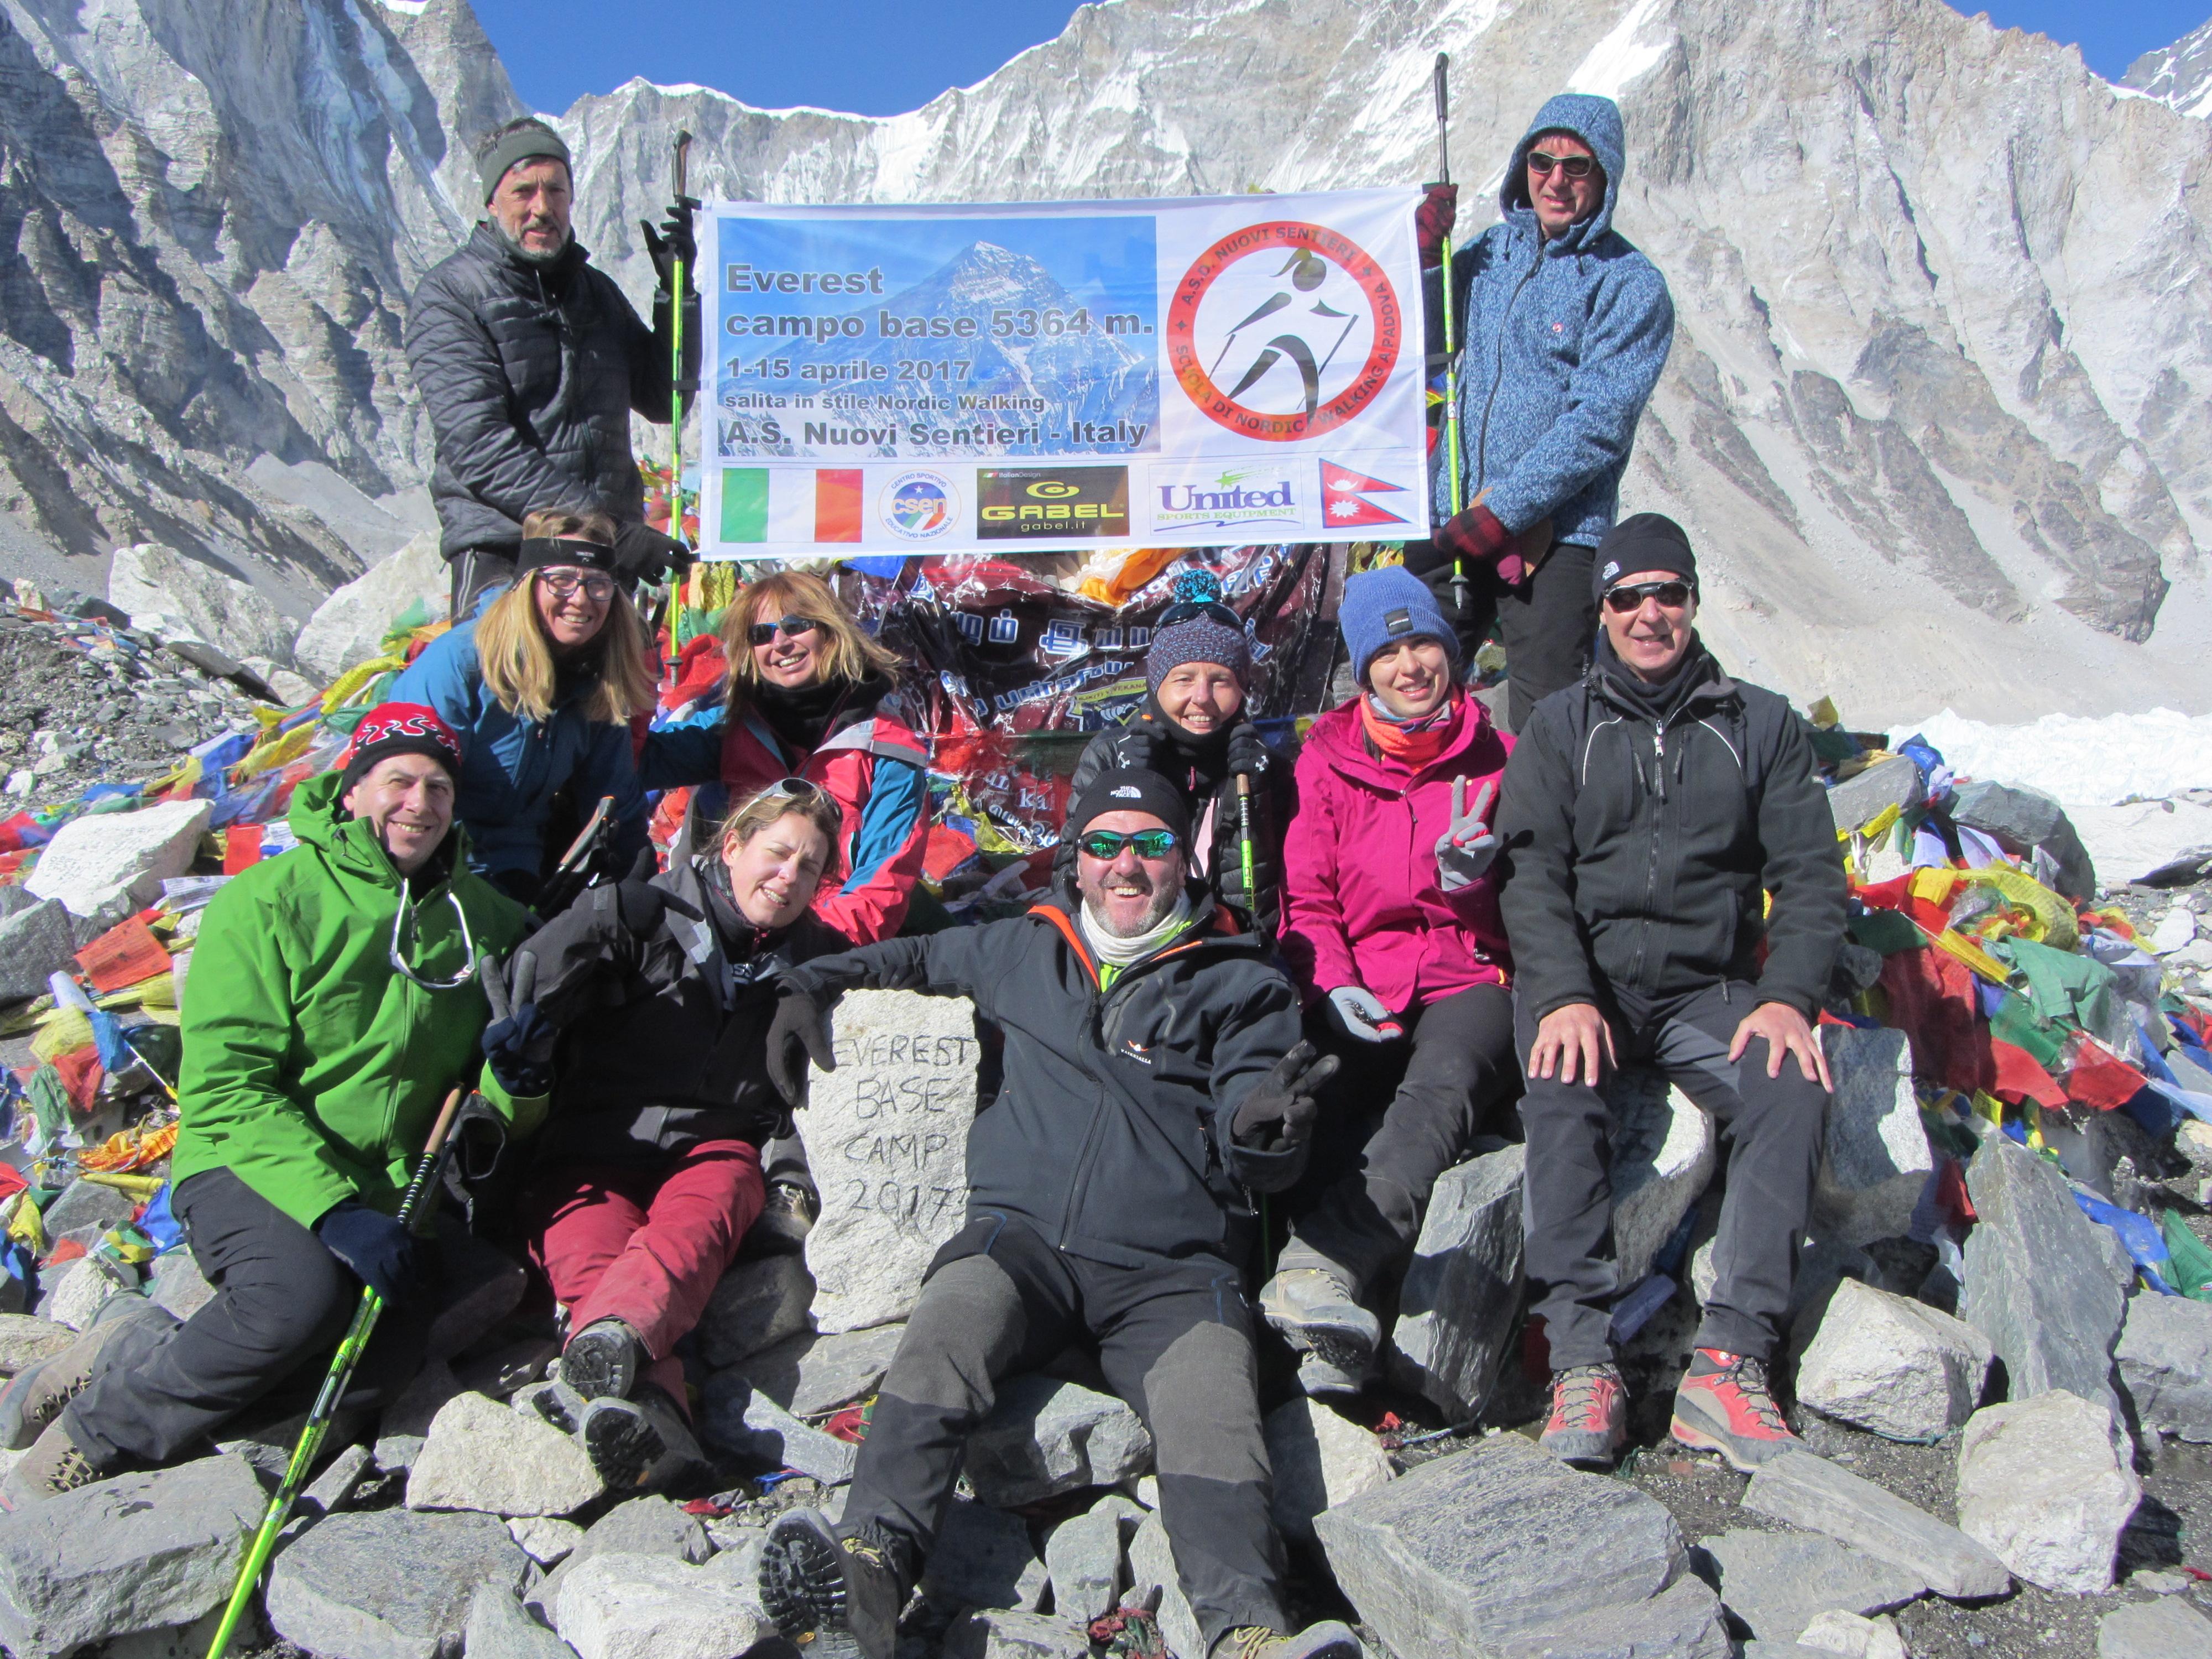 Nordic Walking Vicenza Calendario.Salita Al Campo Base Dell Everest In Stile Nordic Walking